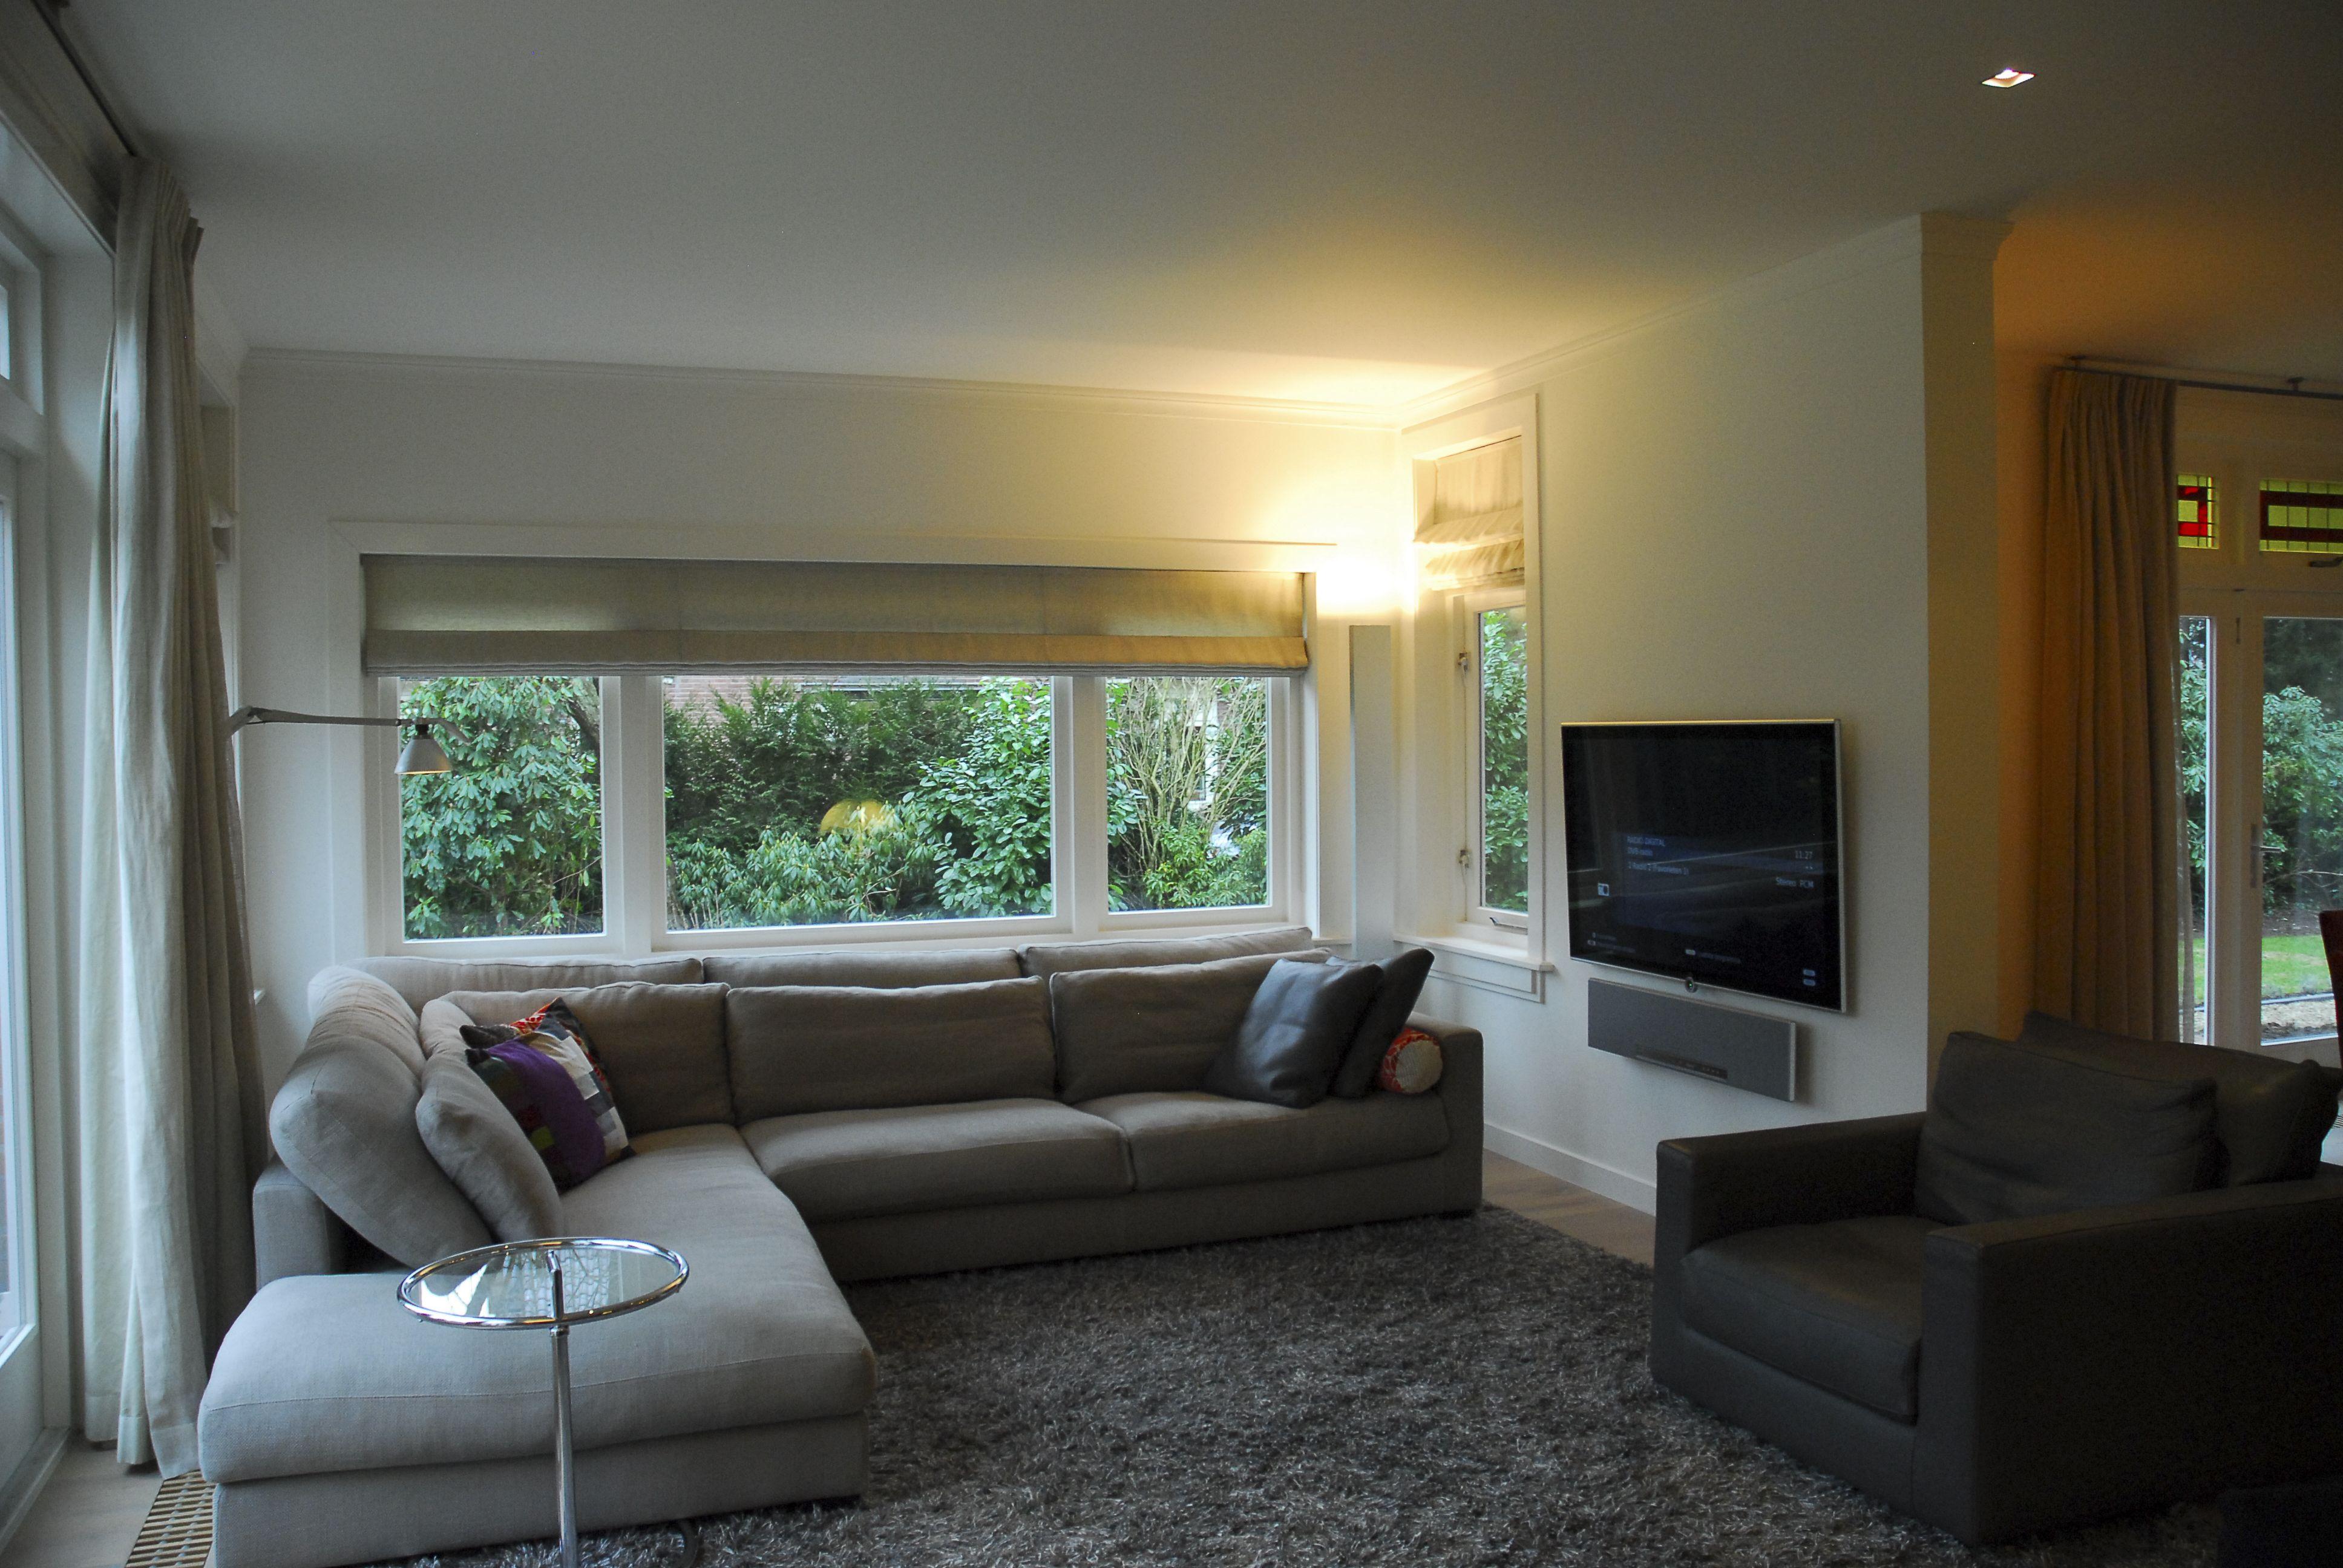 Hanneke huisman interieurs living room design for a residential